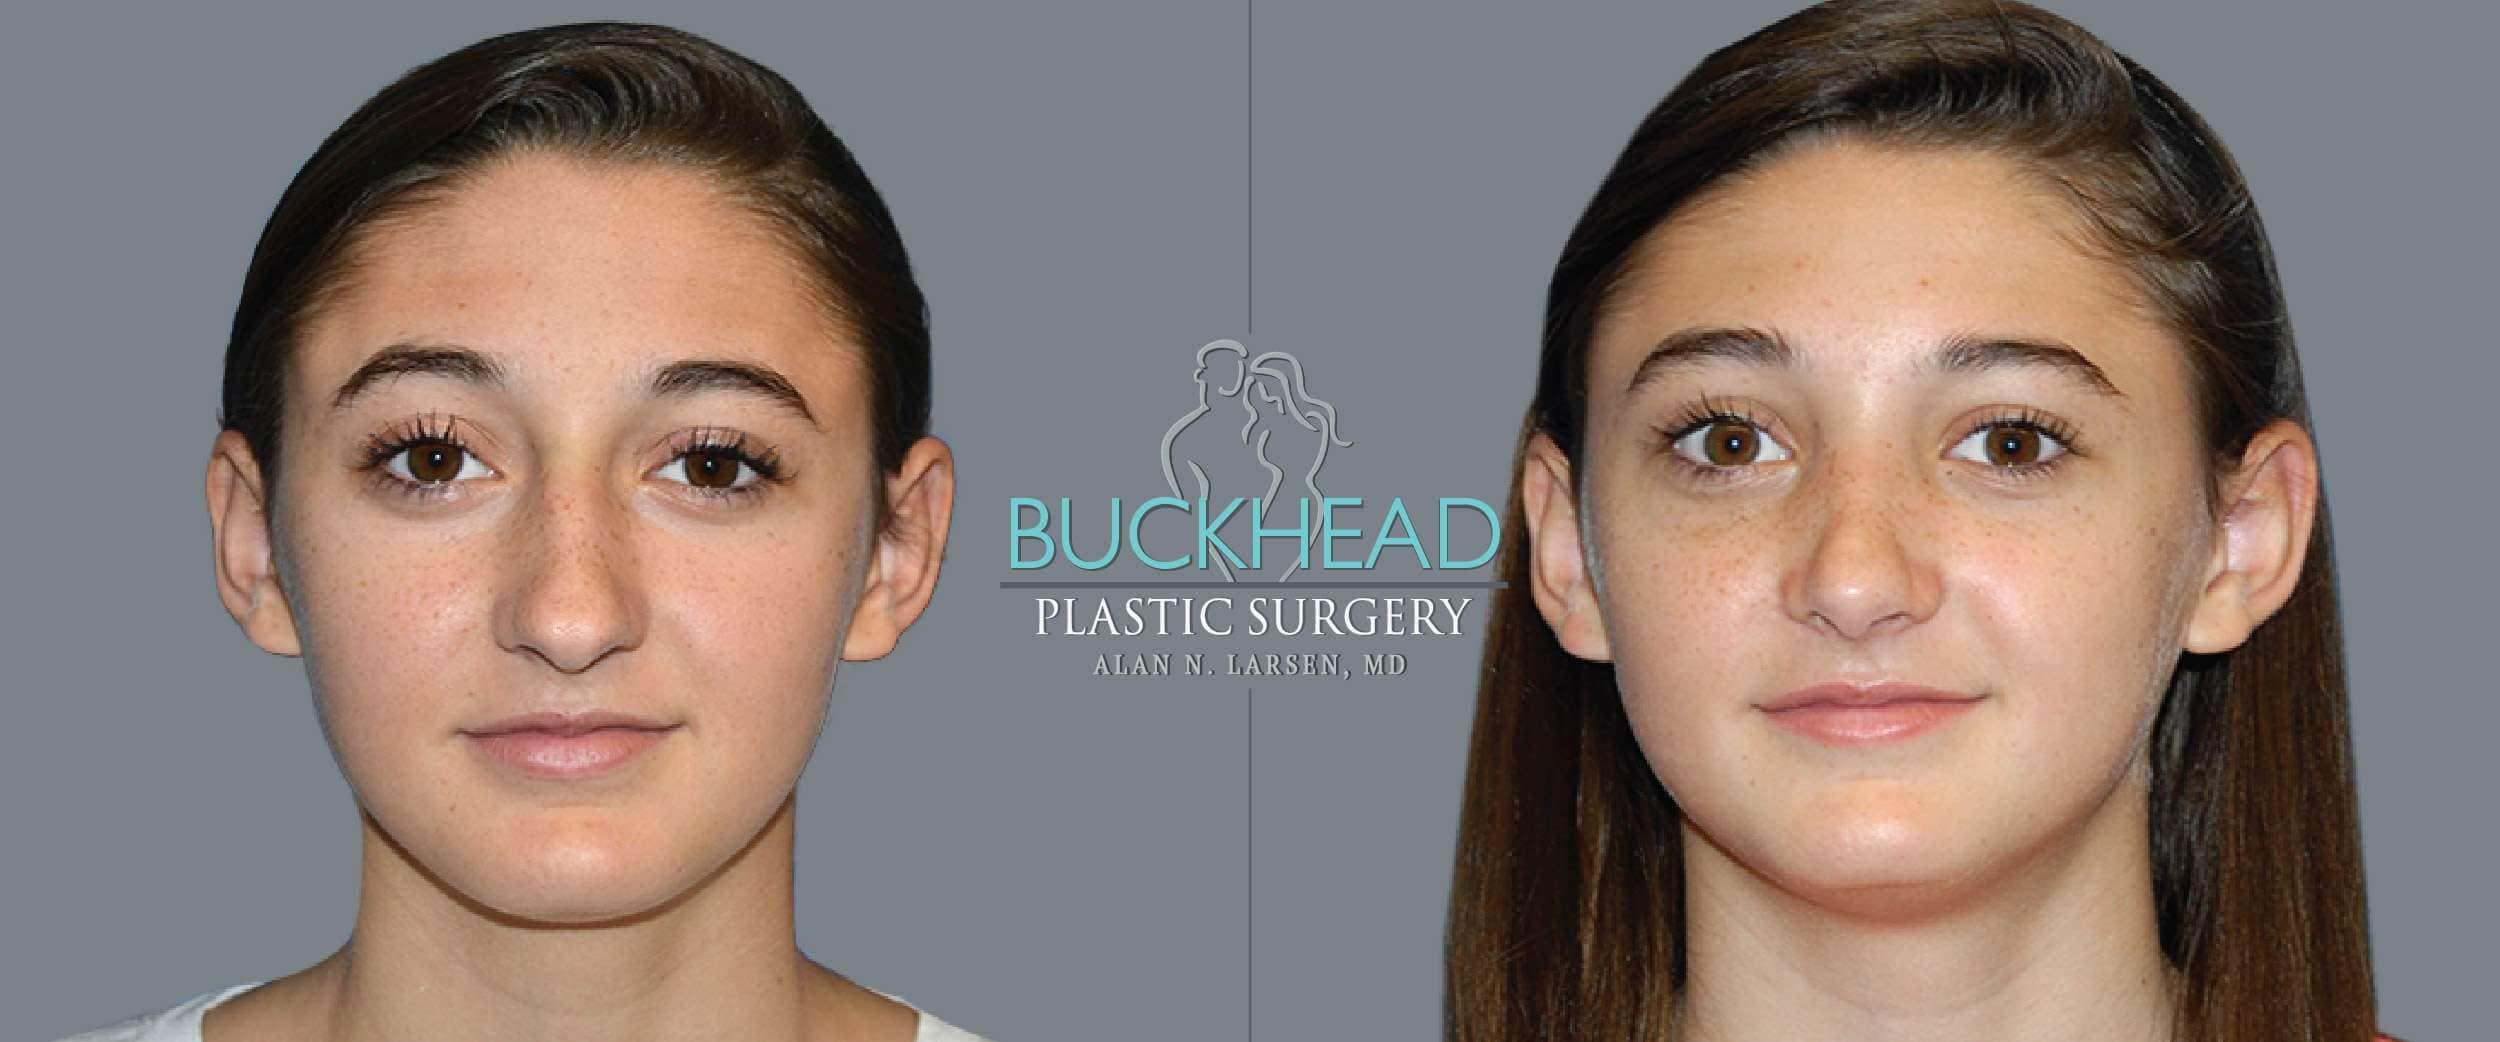 Before and After Photo gallery | Rhinoplasty | Buckhead Plastic Surgery | Board-Certified Plastic Surgeon in Atlanta GA